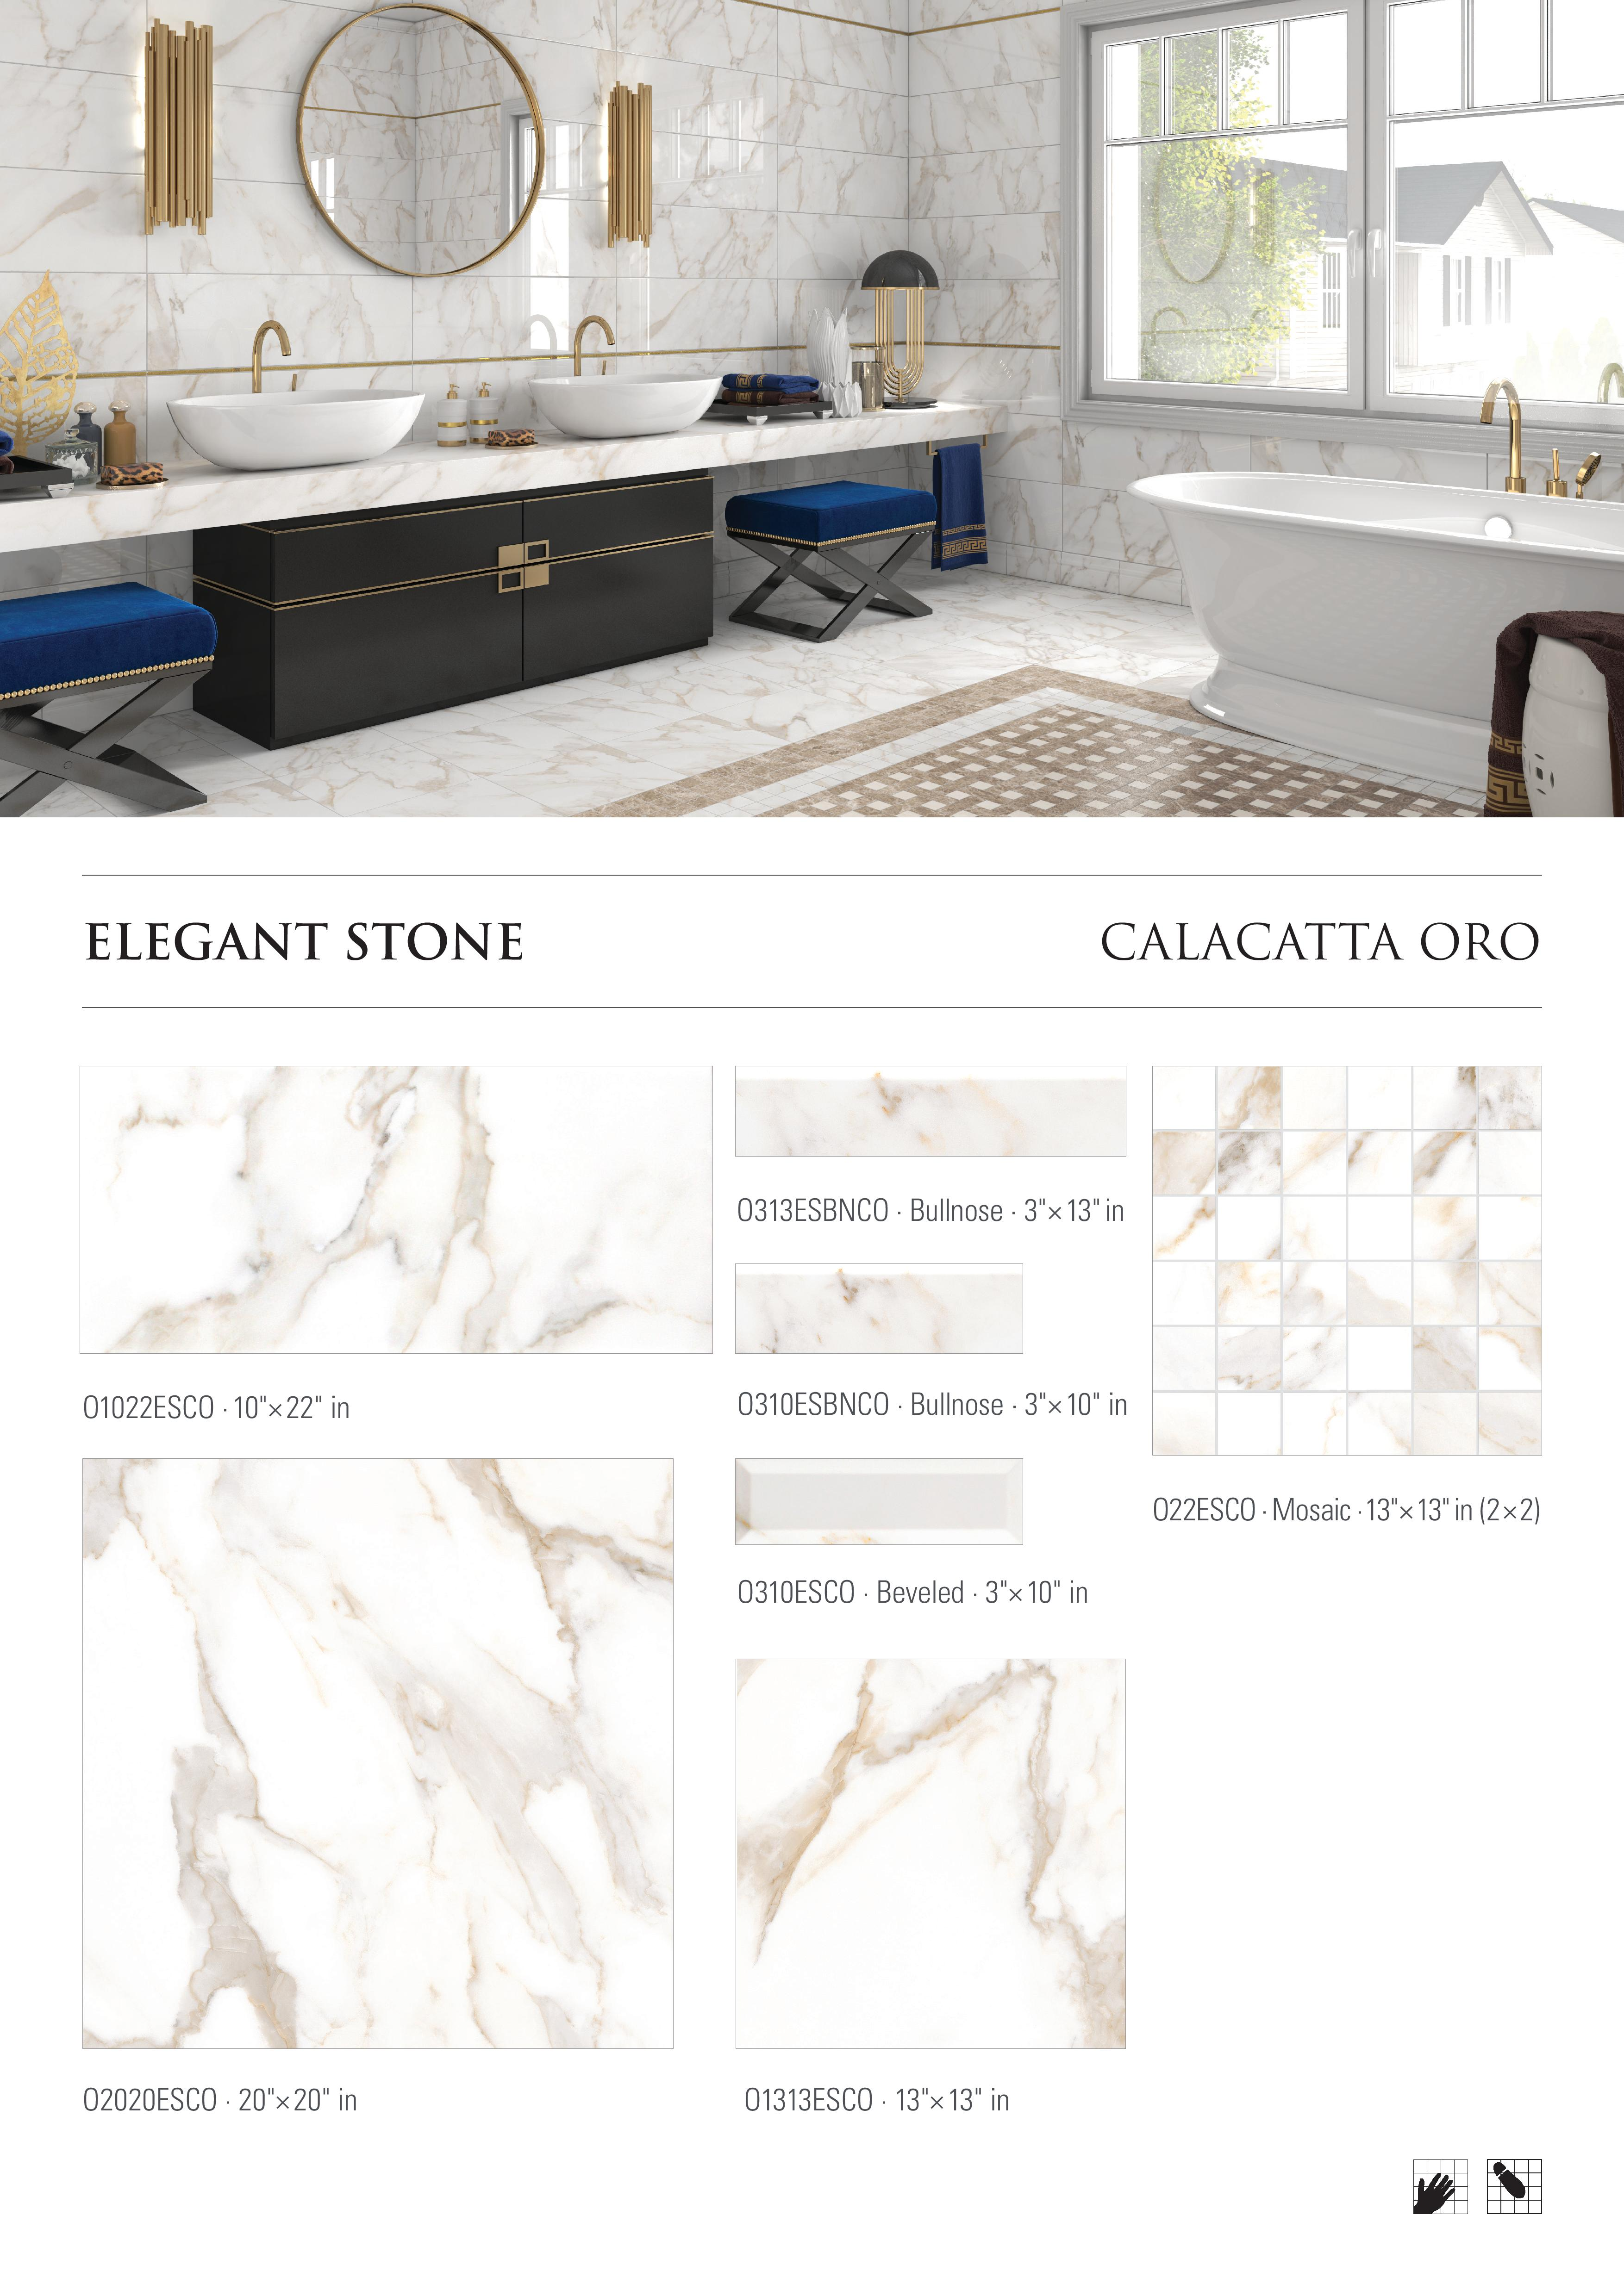 Elegant Stone Calacutta Oro Porcelain Tile by Opulenza at belktile.com